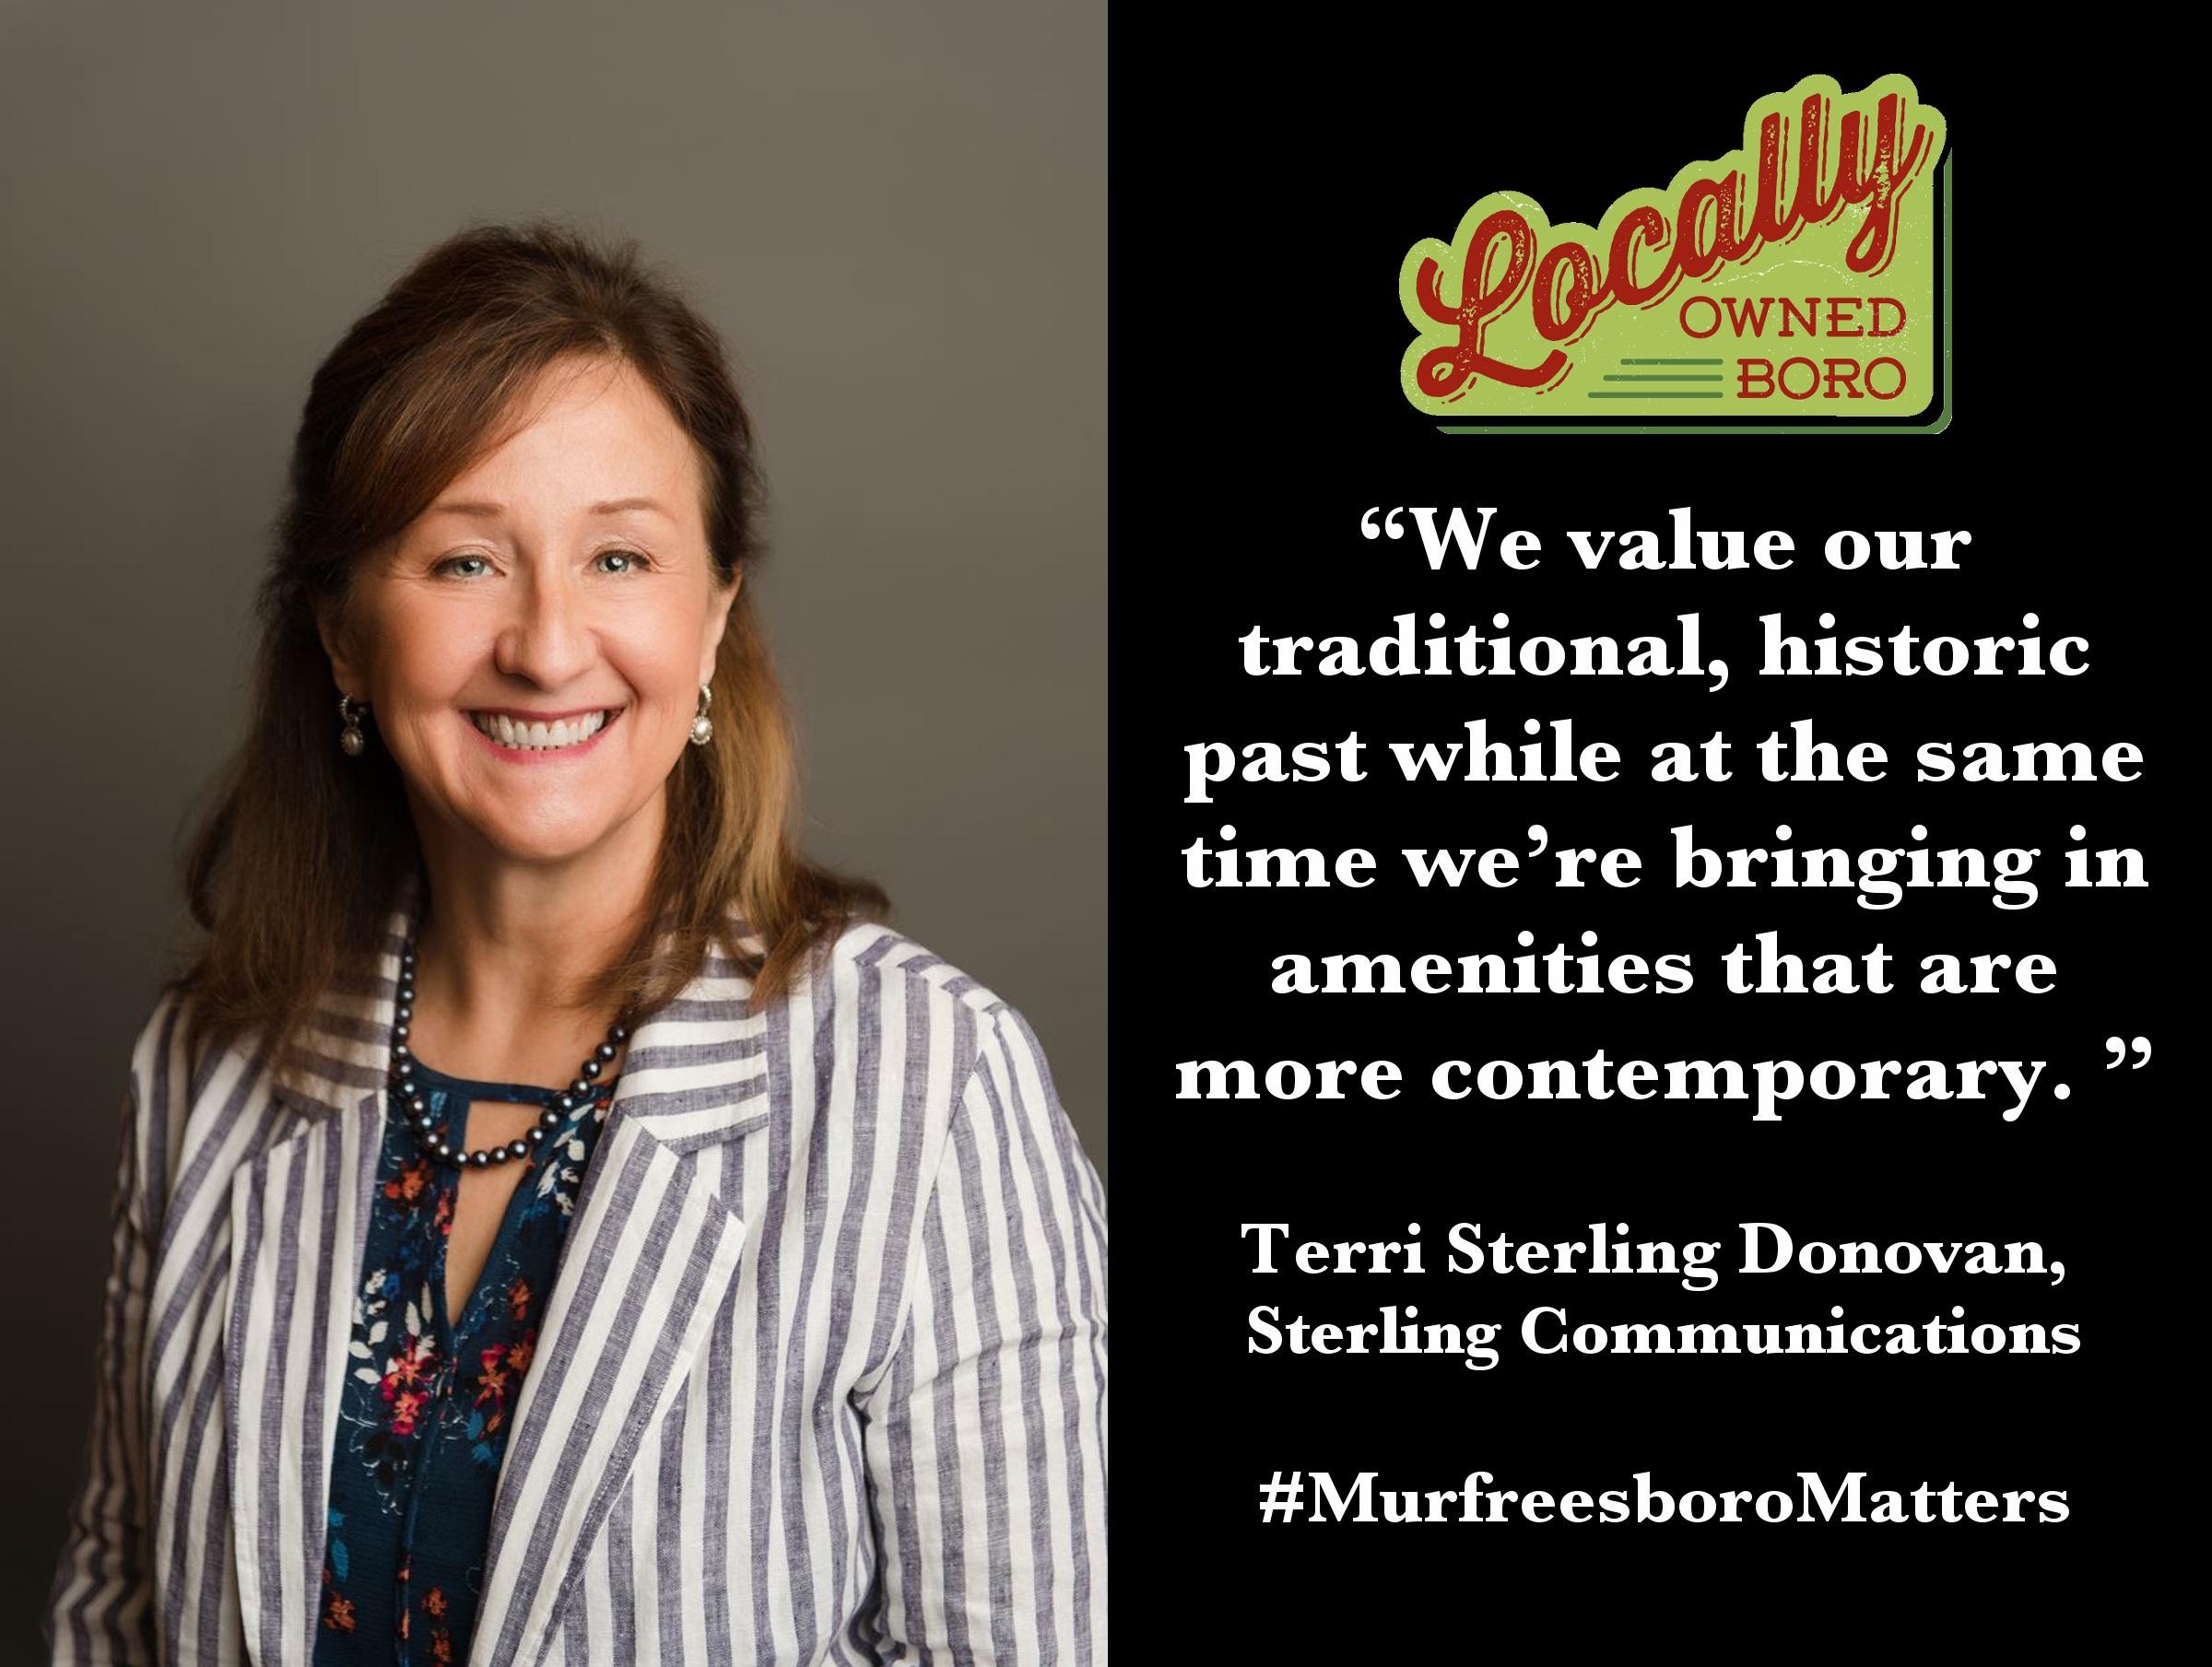 Terri Sterling, principal at Sterling Communications